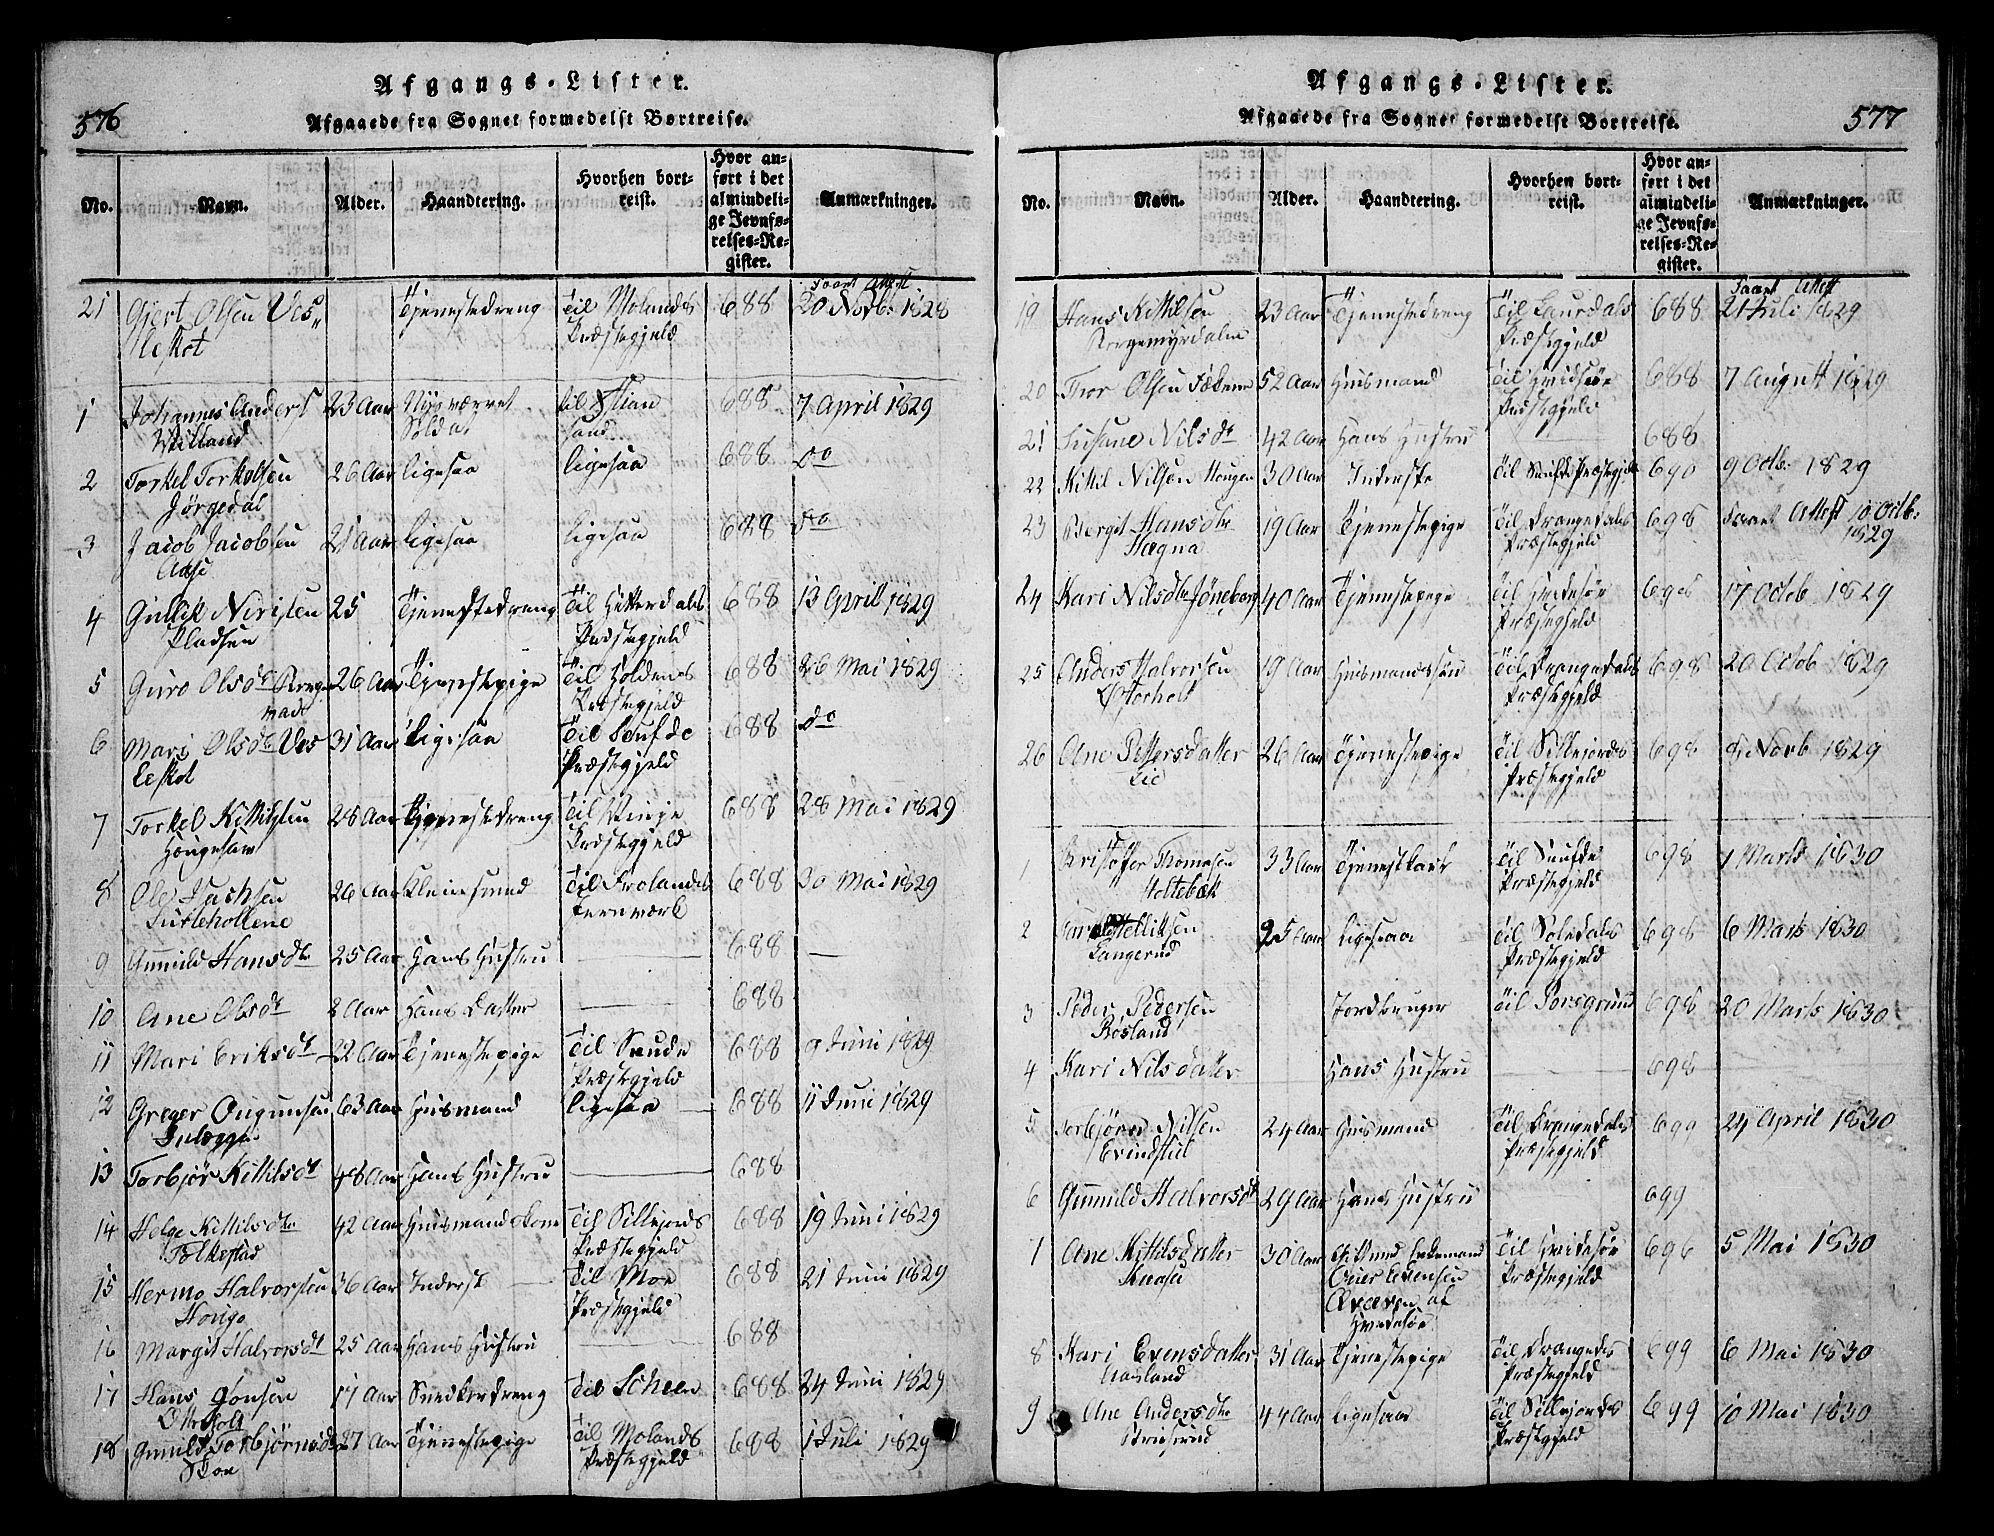 SAKO, Bø kirkebøker, G/Ga/L0001: Klokkerbok nr. 1, 1815-1831, s. 576-577